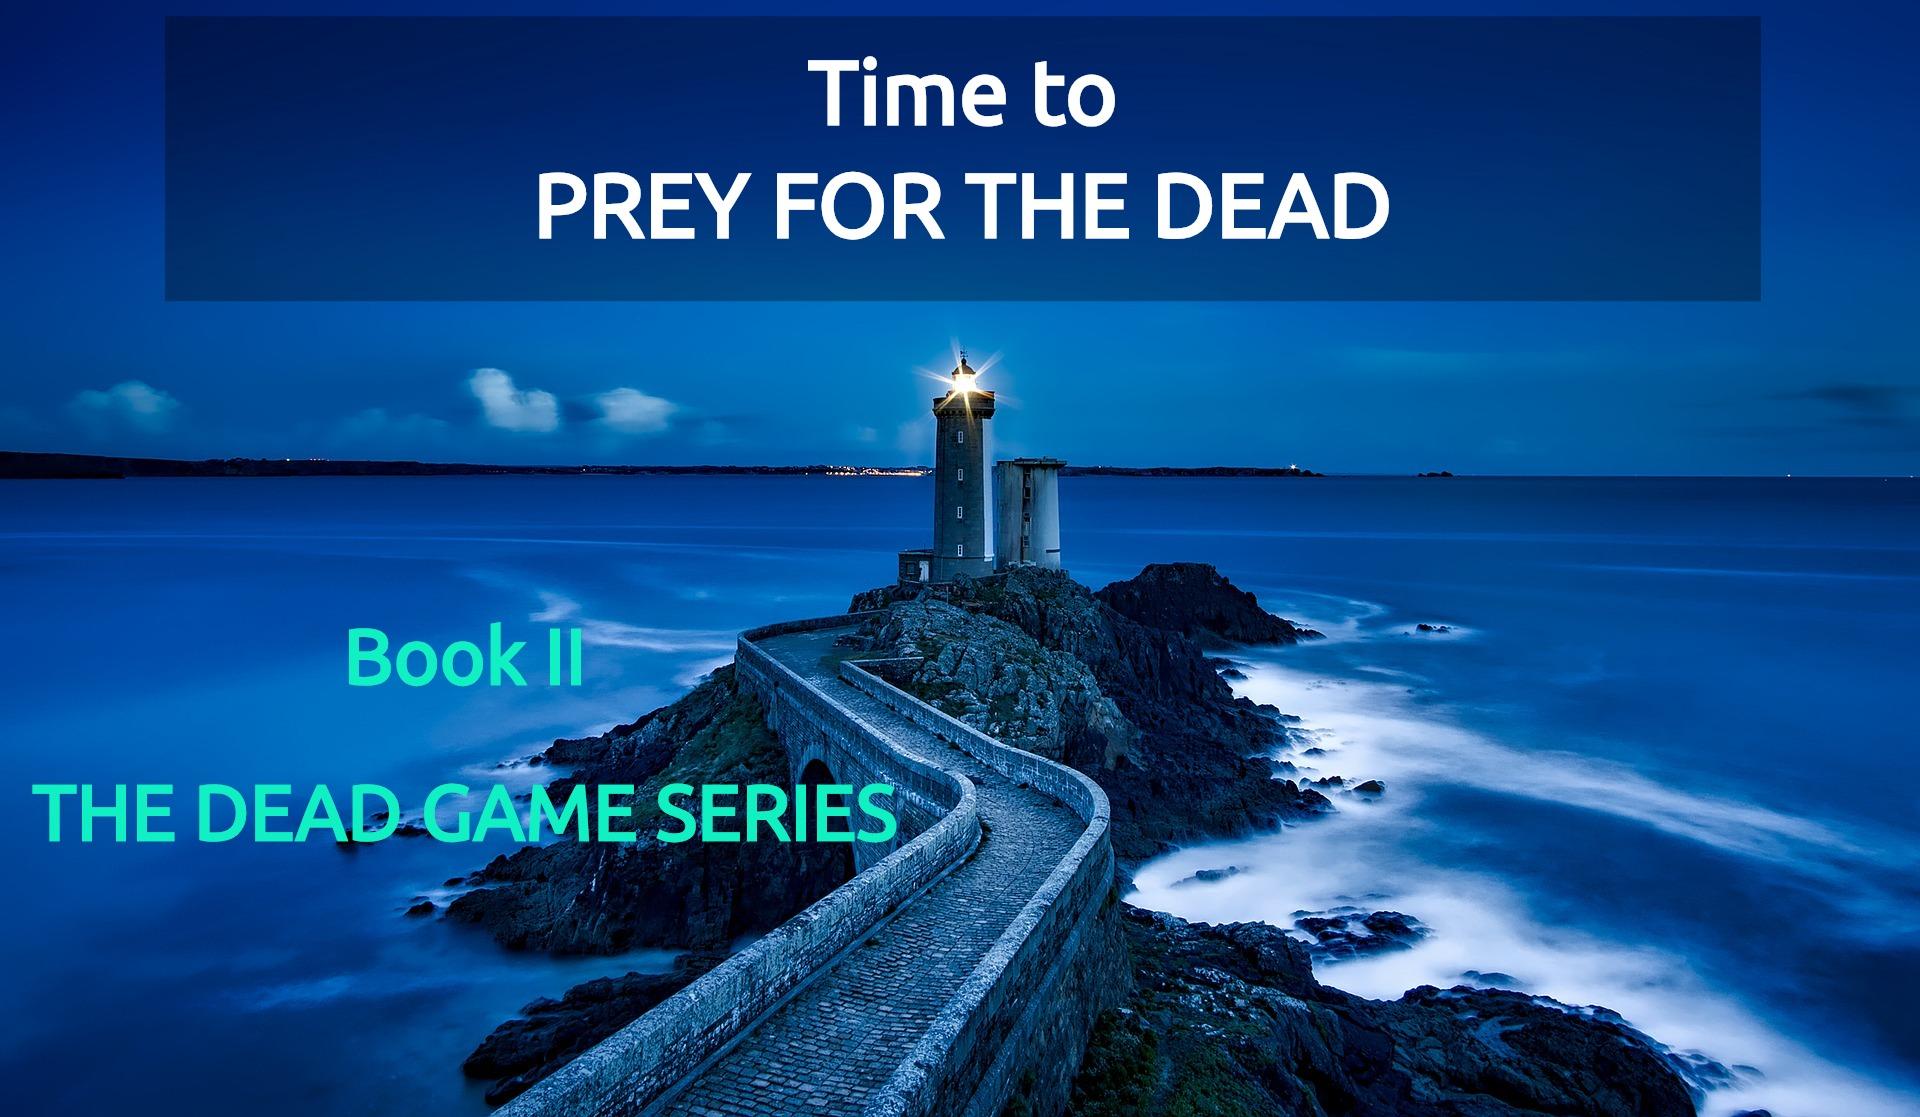 Prey for The Dead Book II